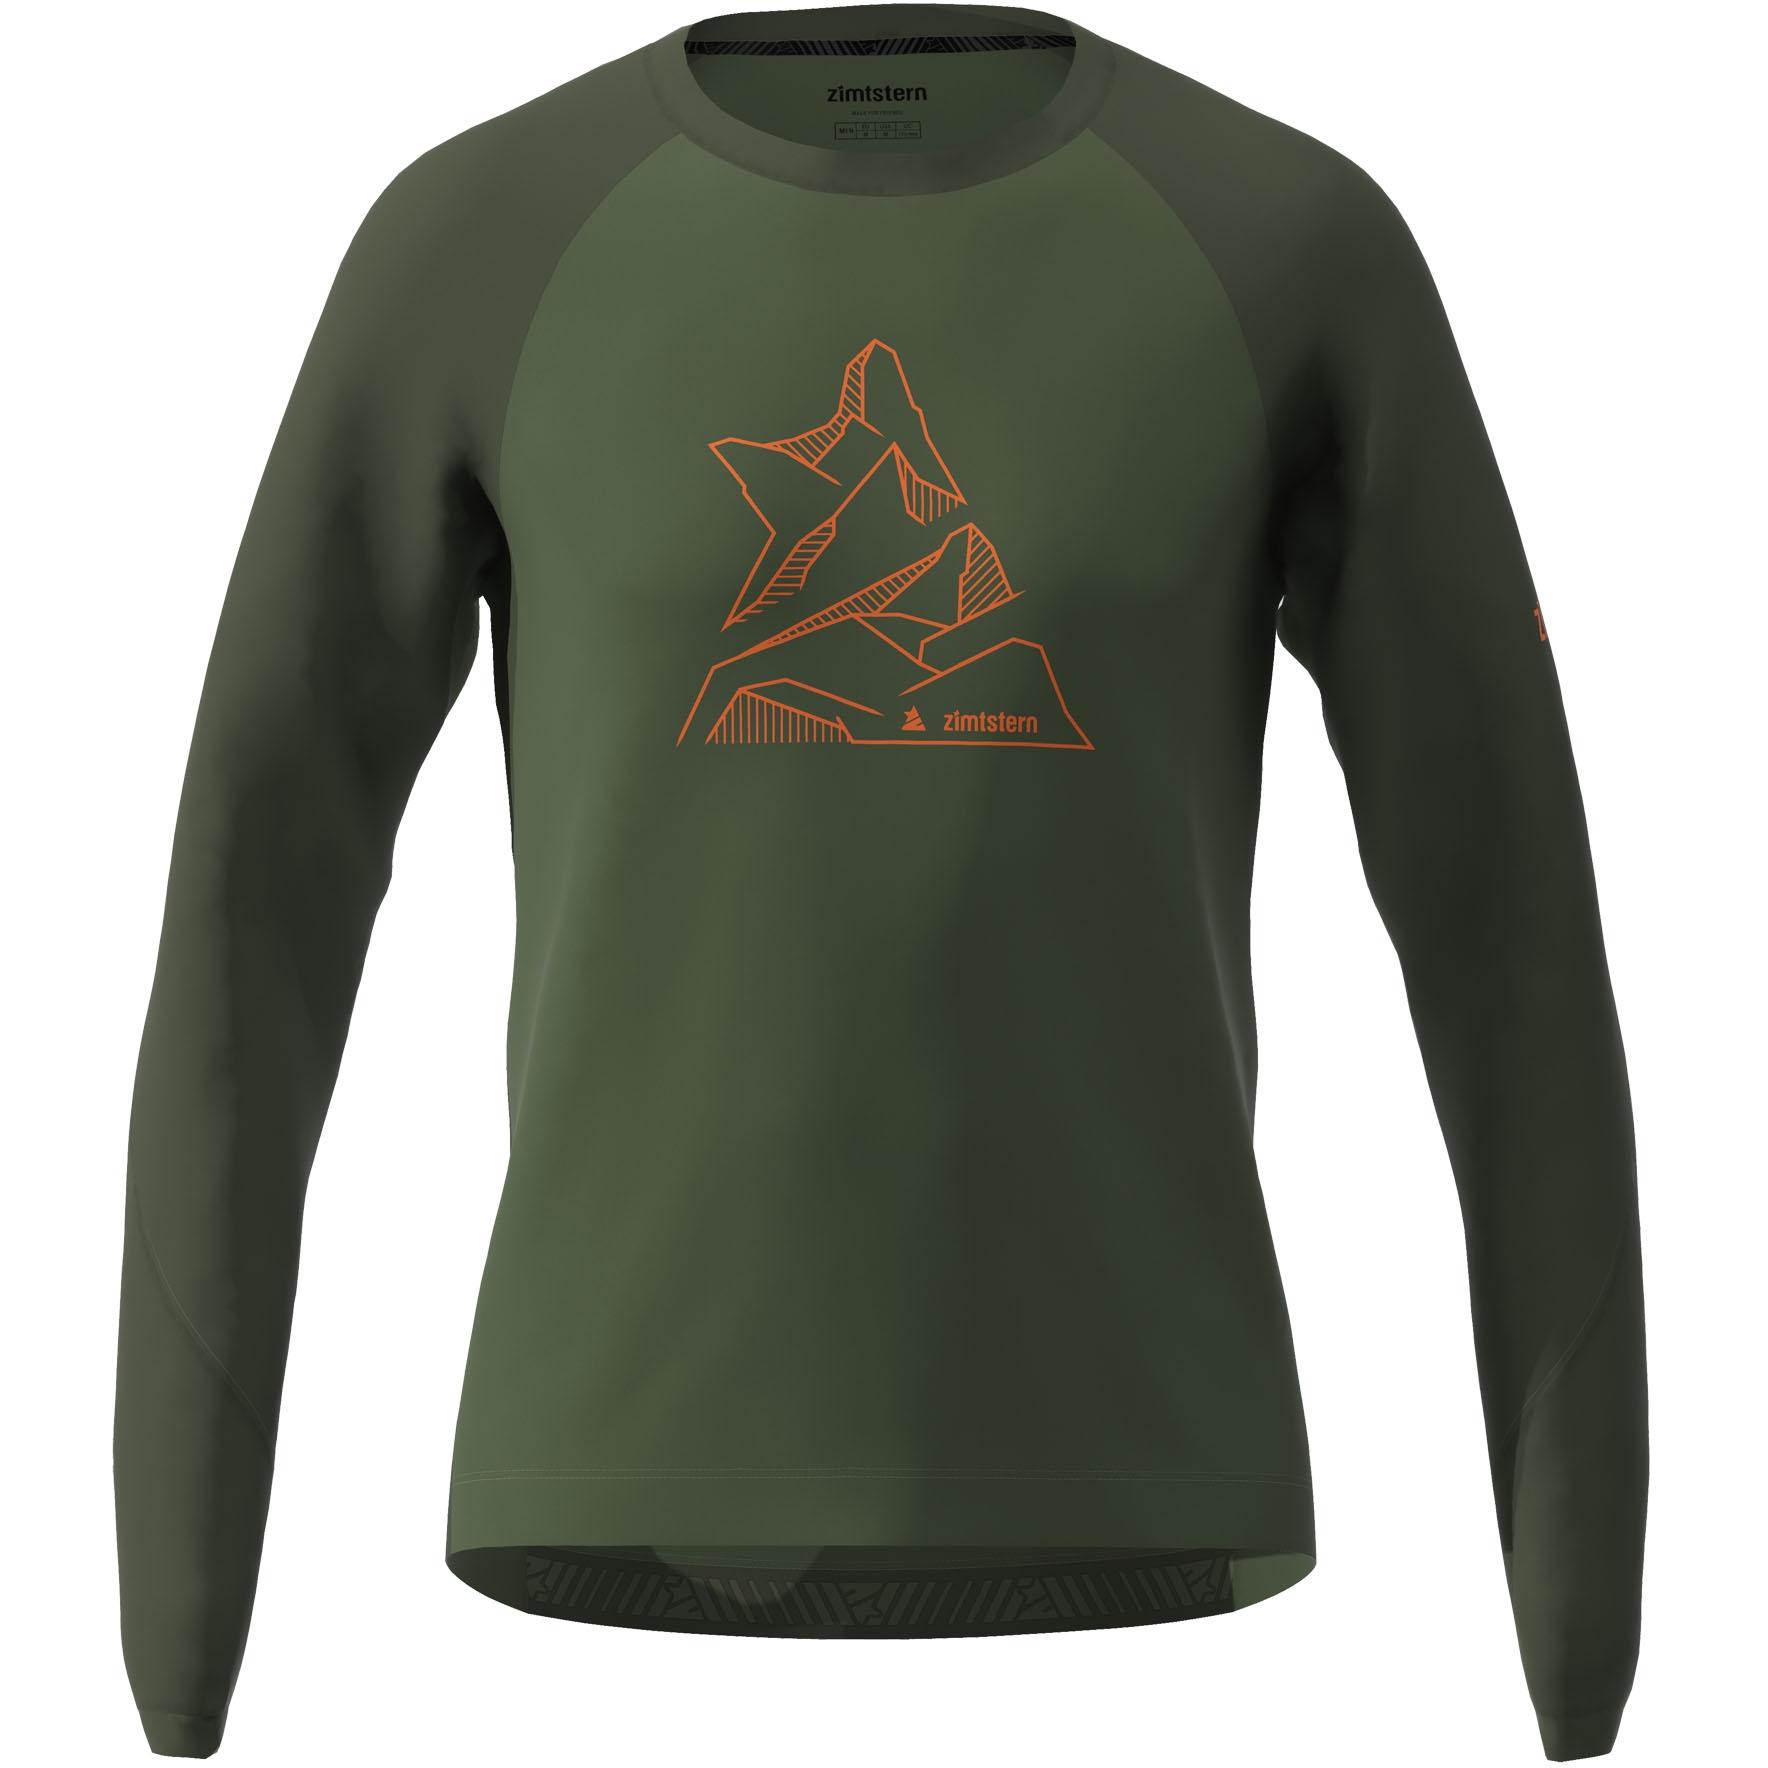 Zimtstern PureFlowz Langarm-Shirt - bronze green/forest night